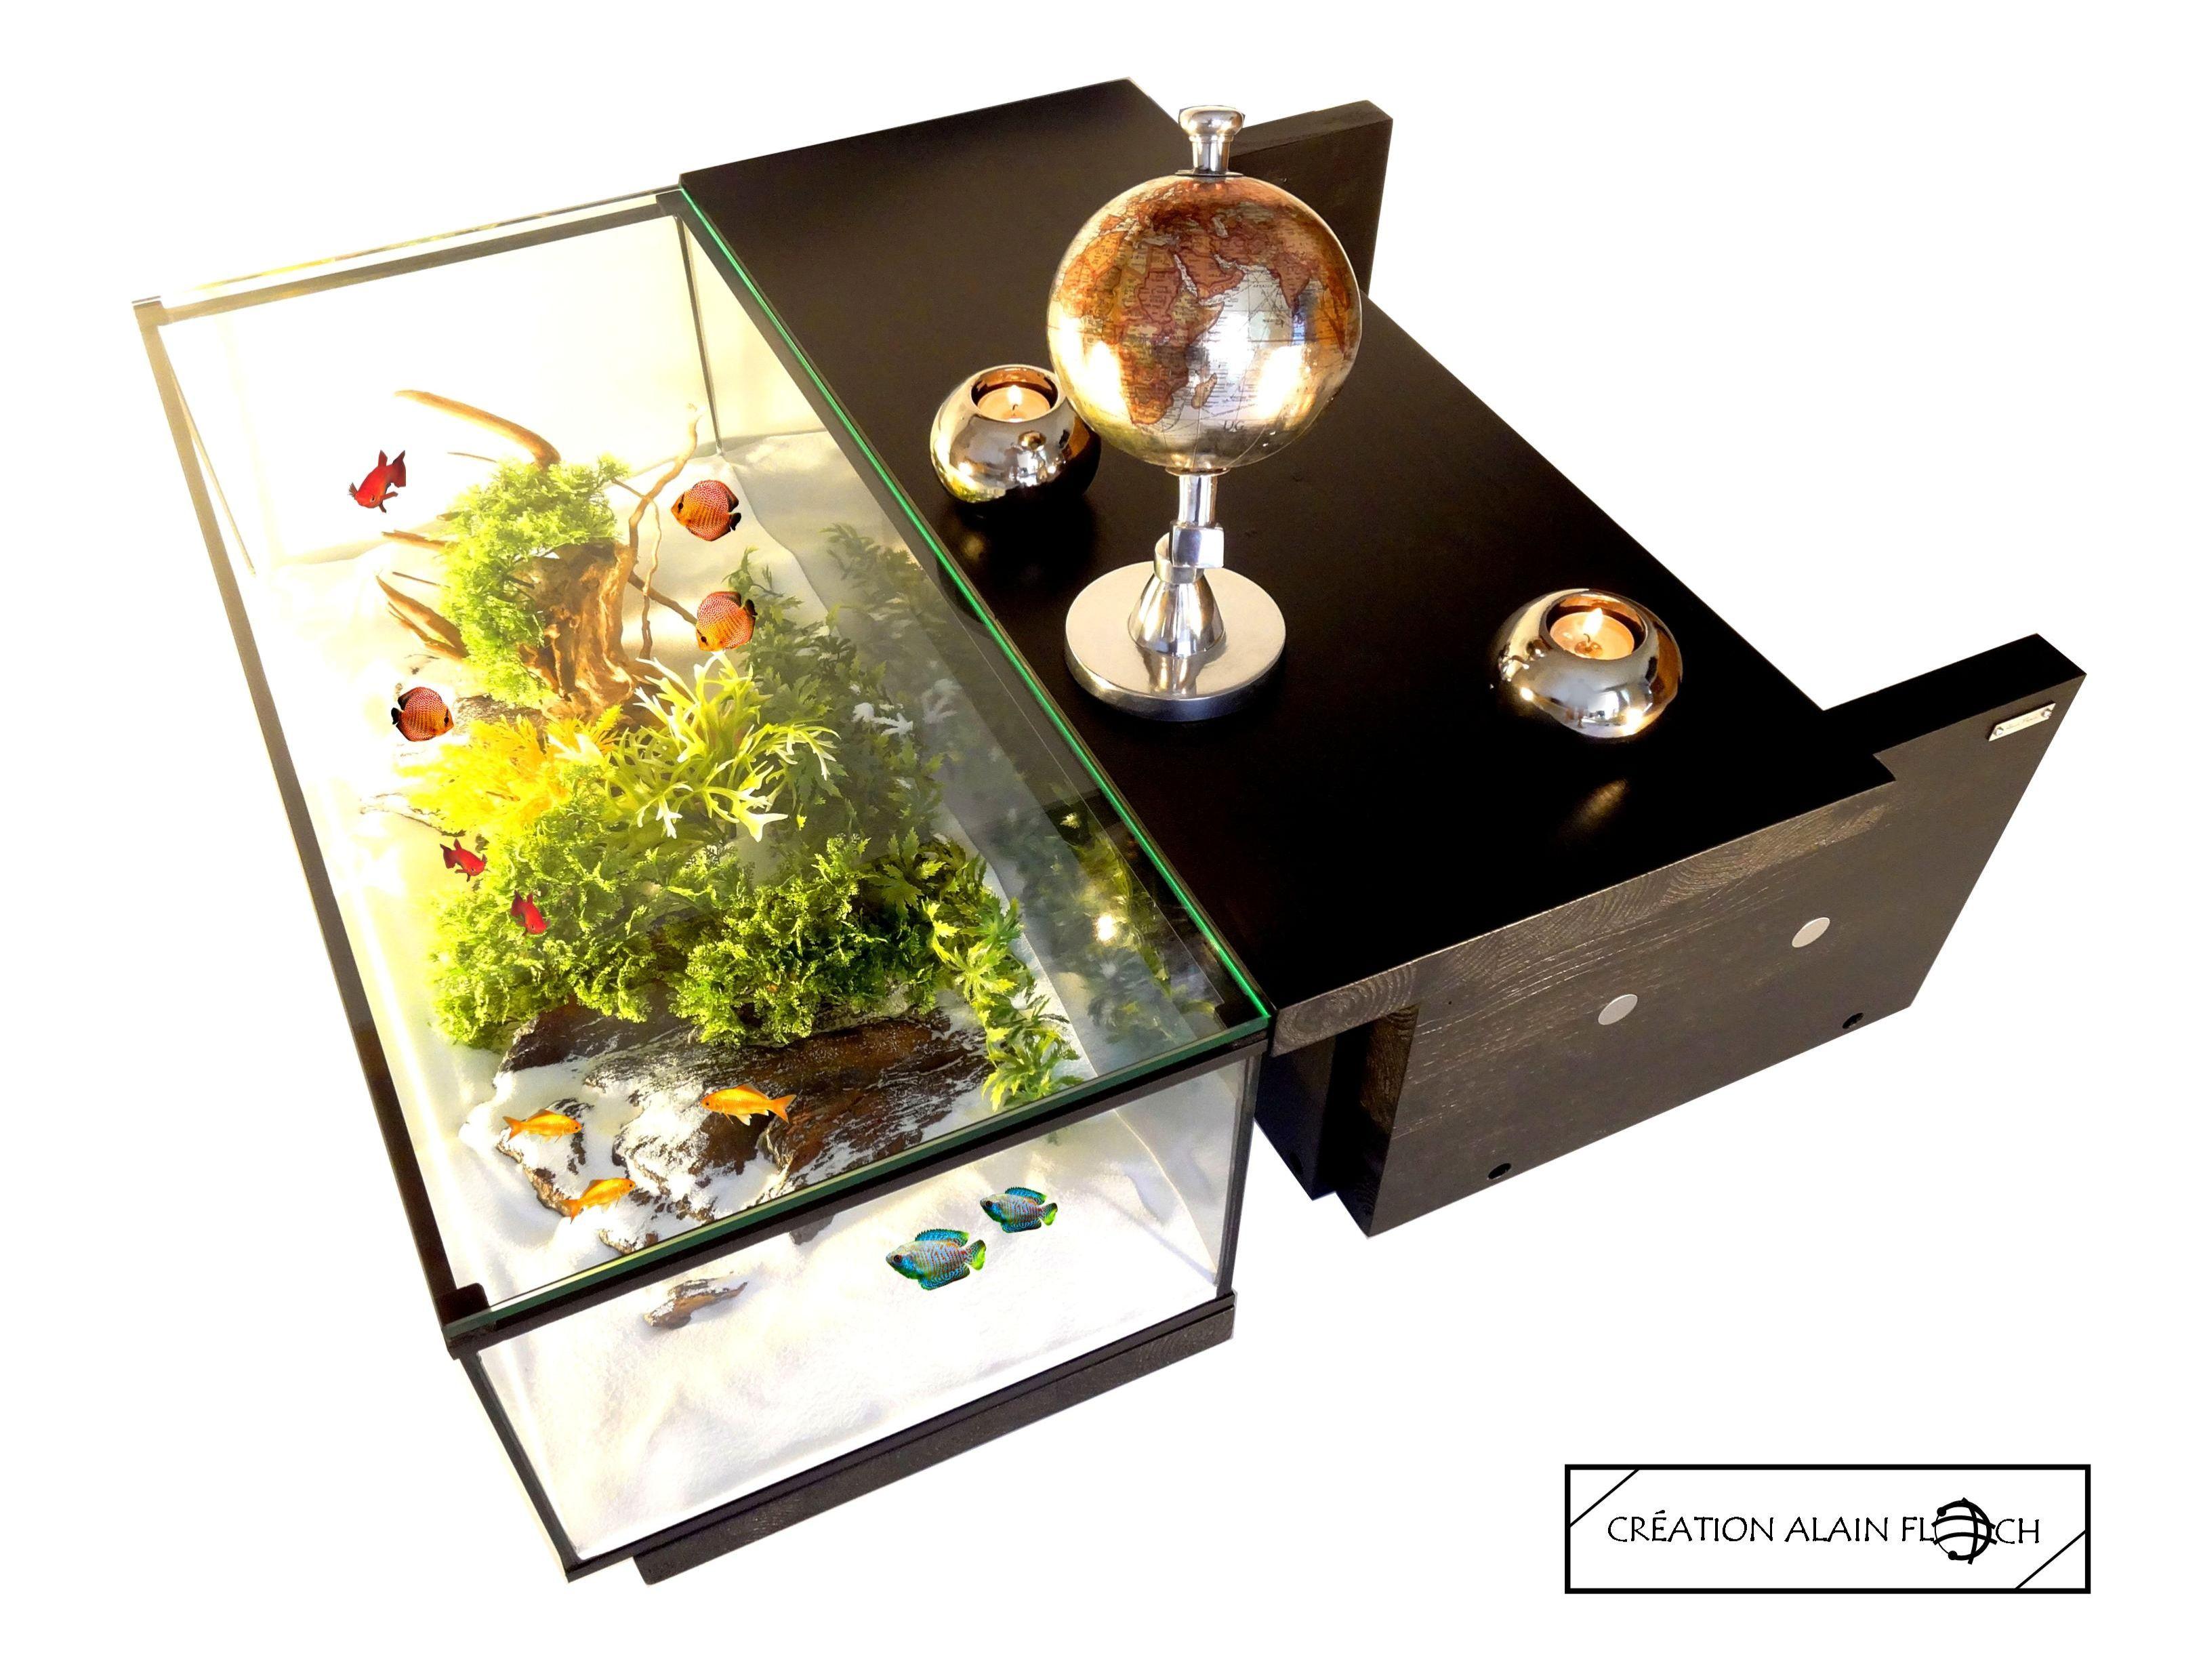 Table Basse Grand Salon table basse design voyage avec grand aquarium 80 cm - 40 led